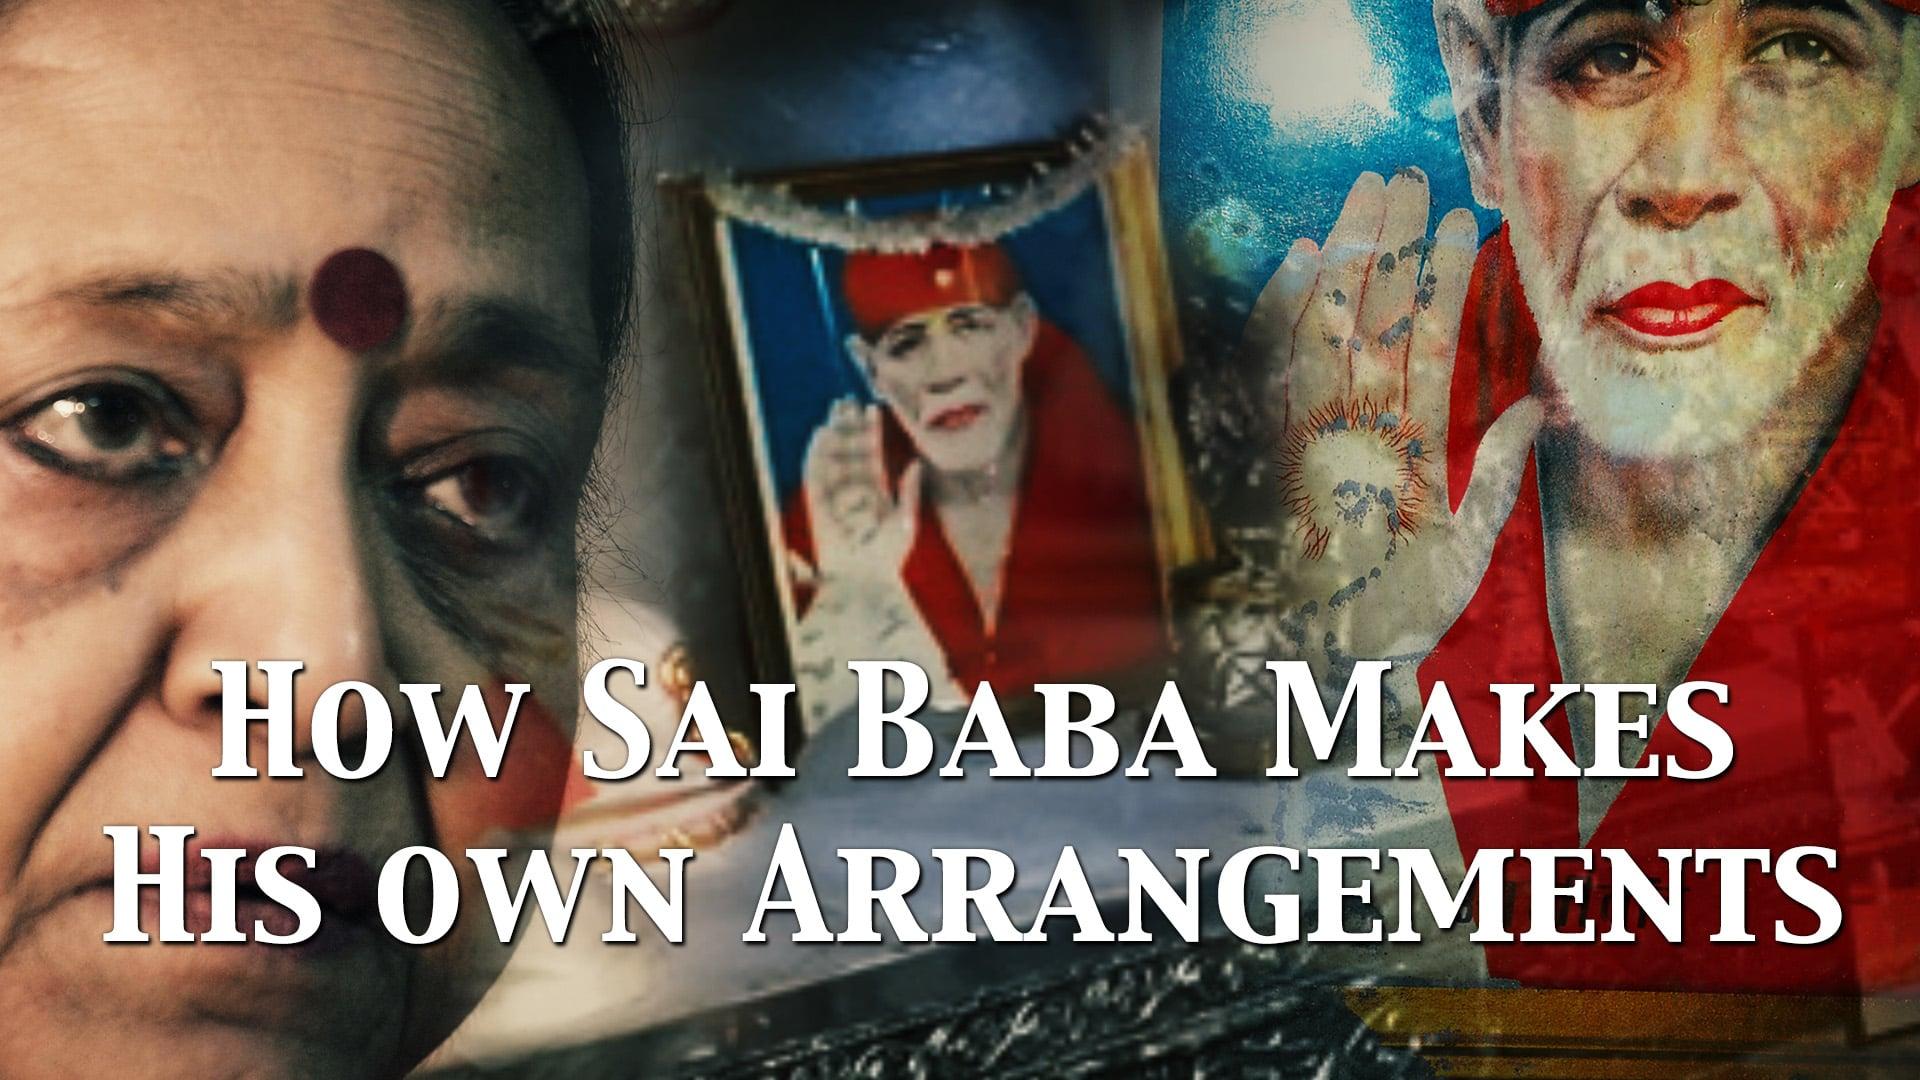 How Sai Baba Makes His Own Arrangements